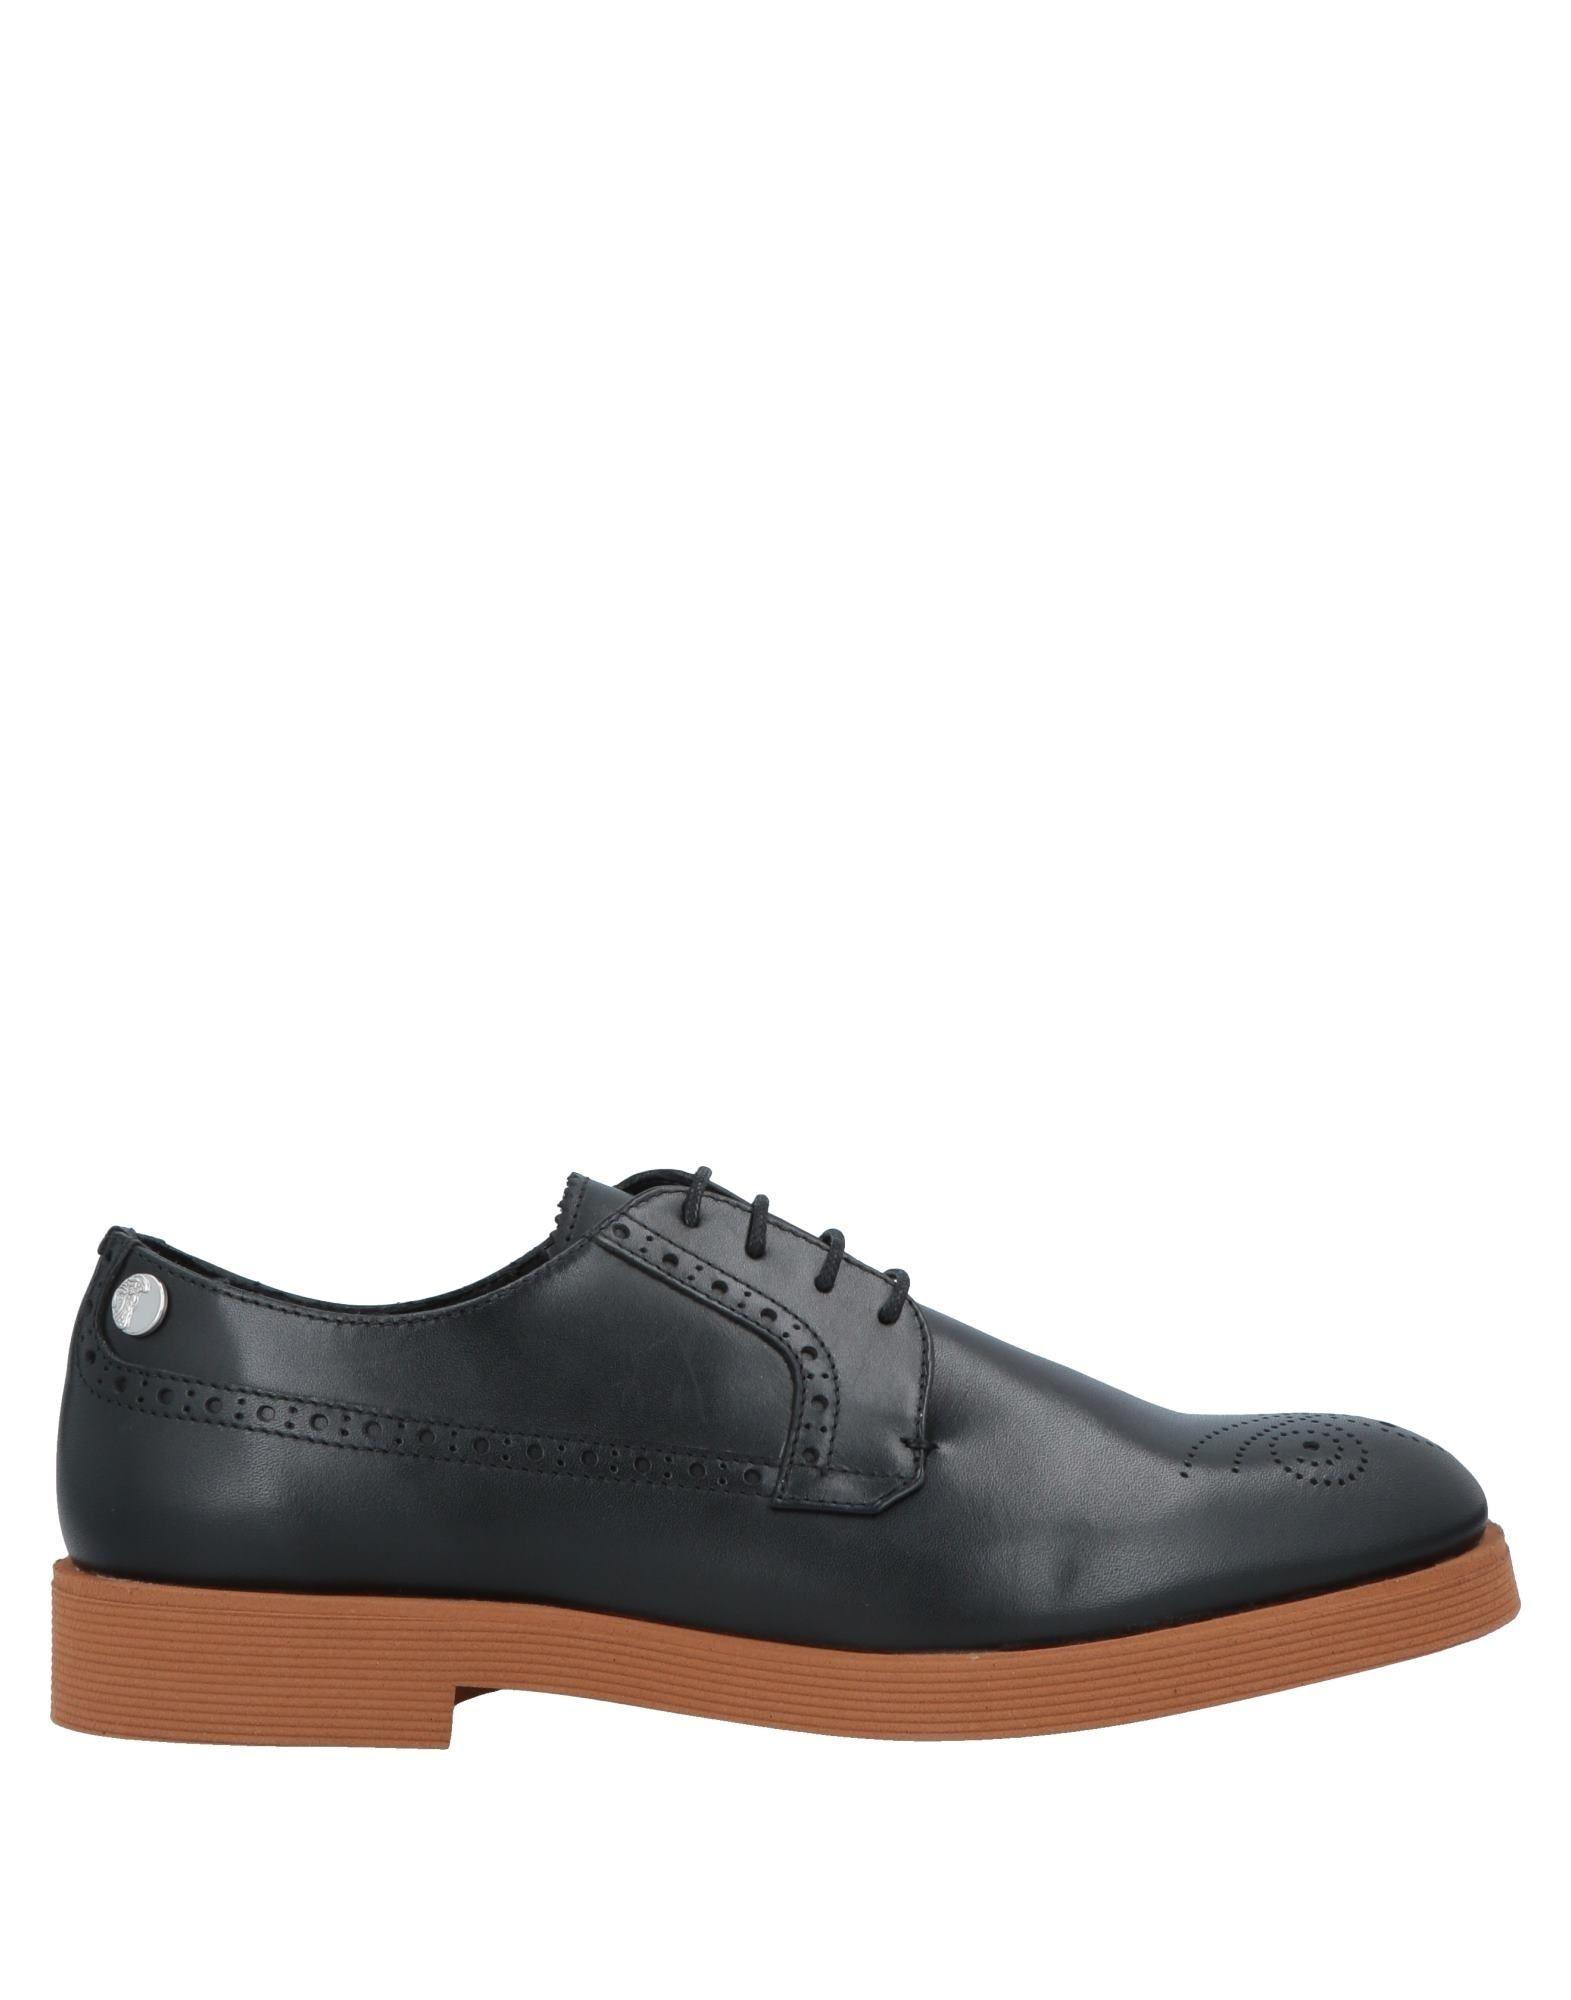 VERSACE COLLECTION Обувь на шнурках versace обувь на шнурках